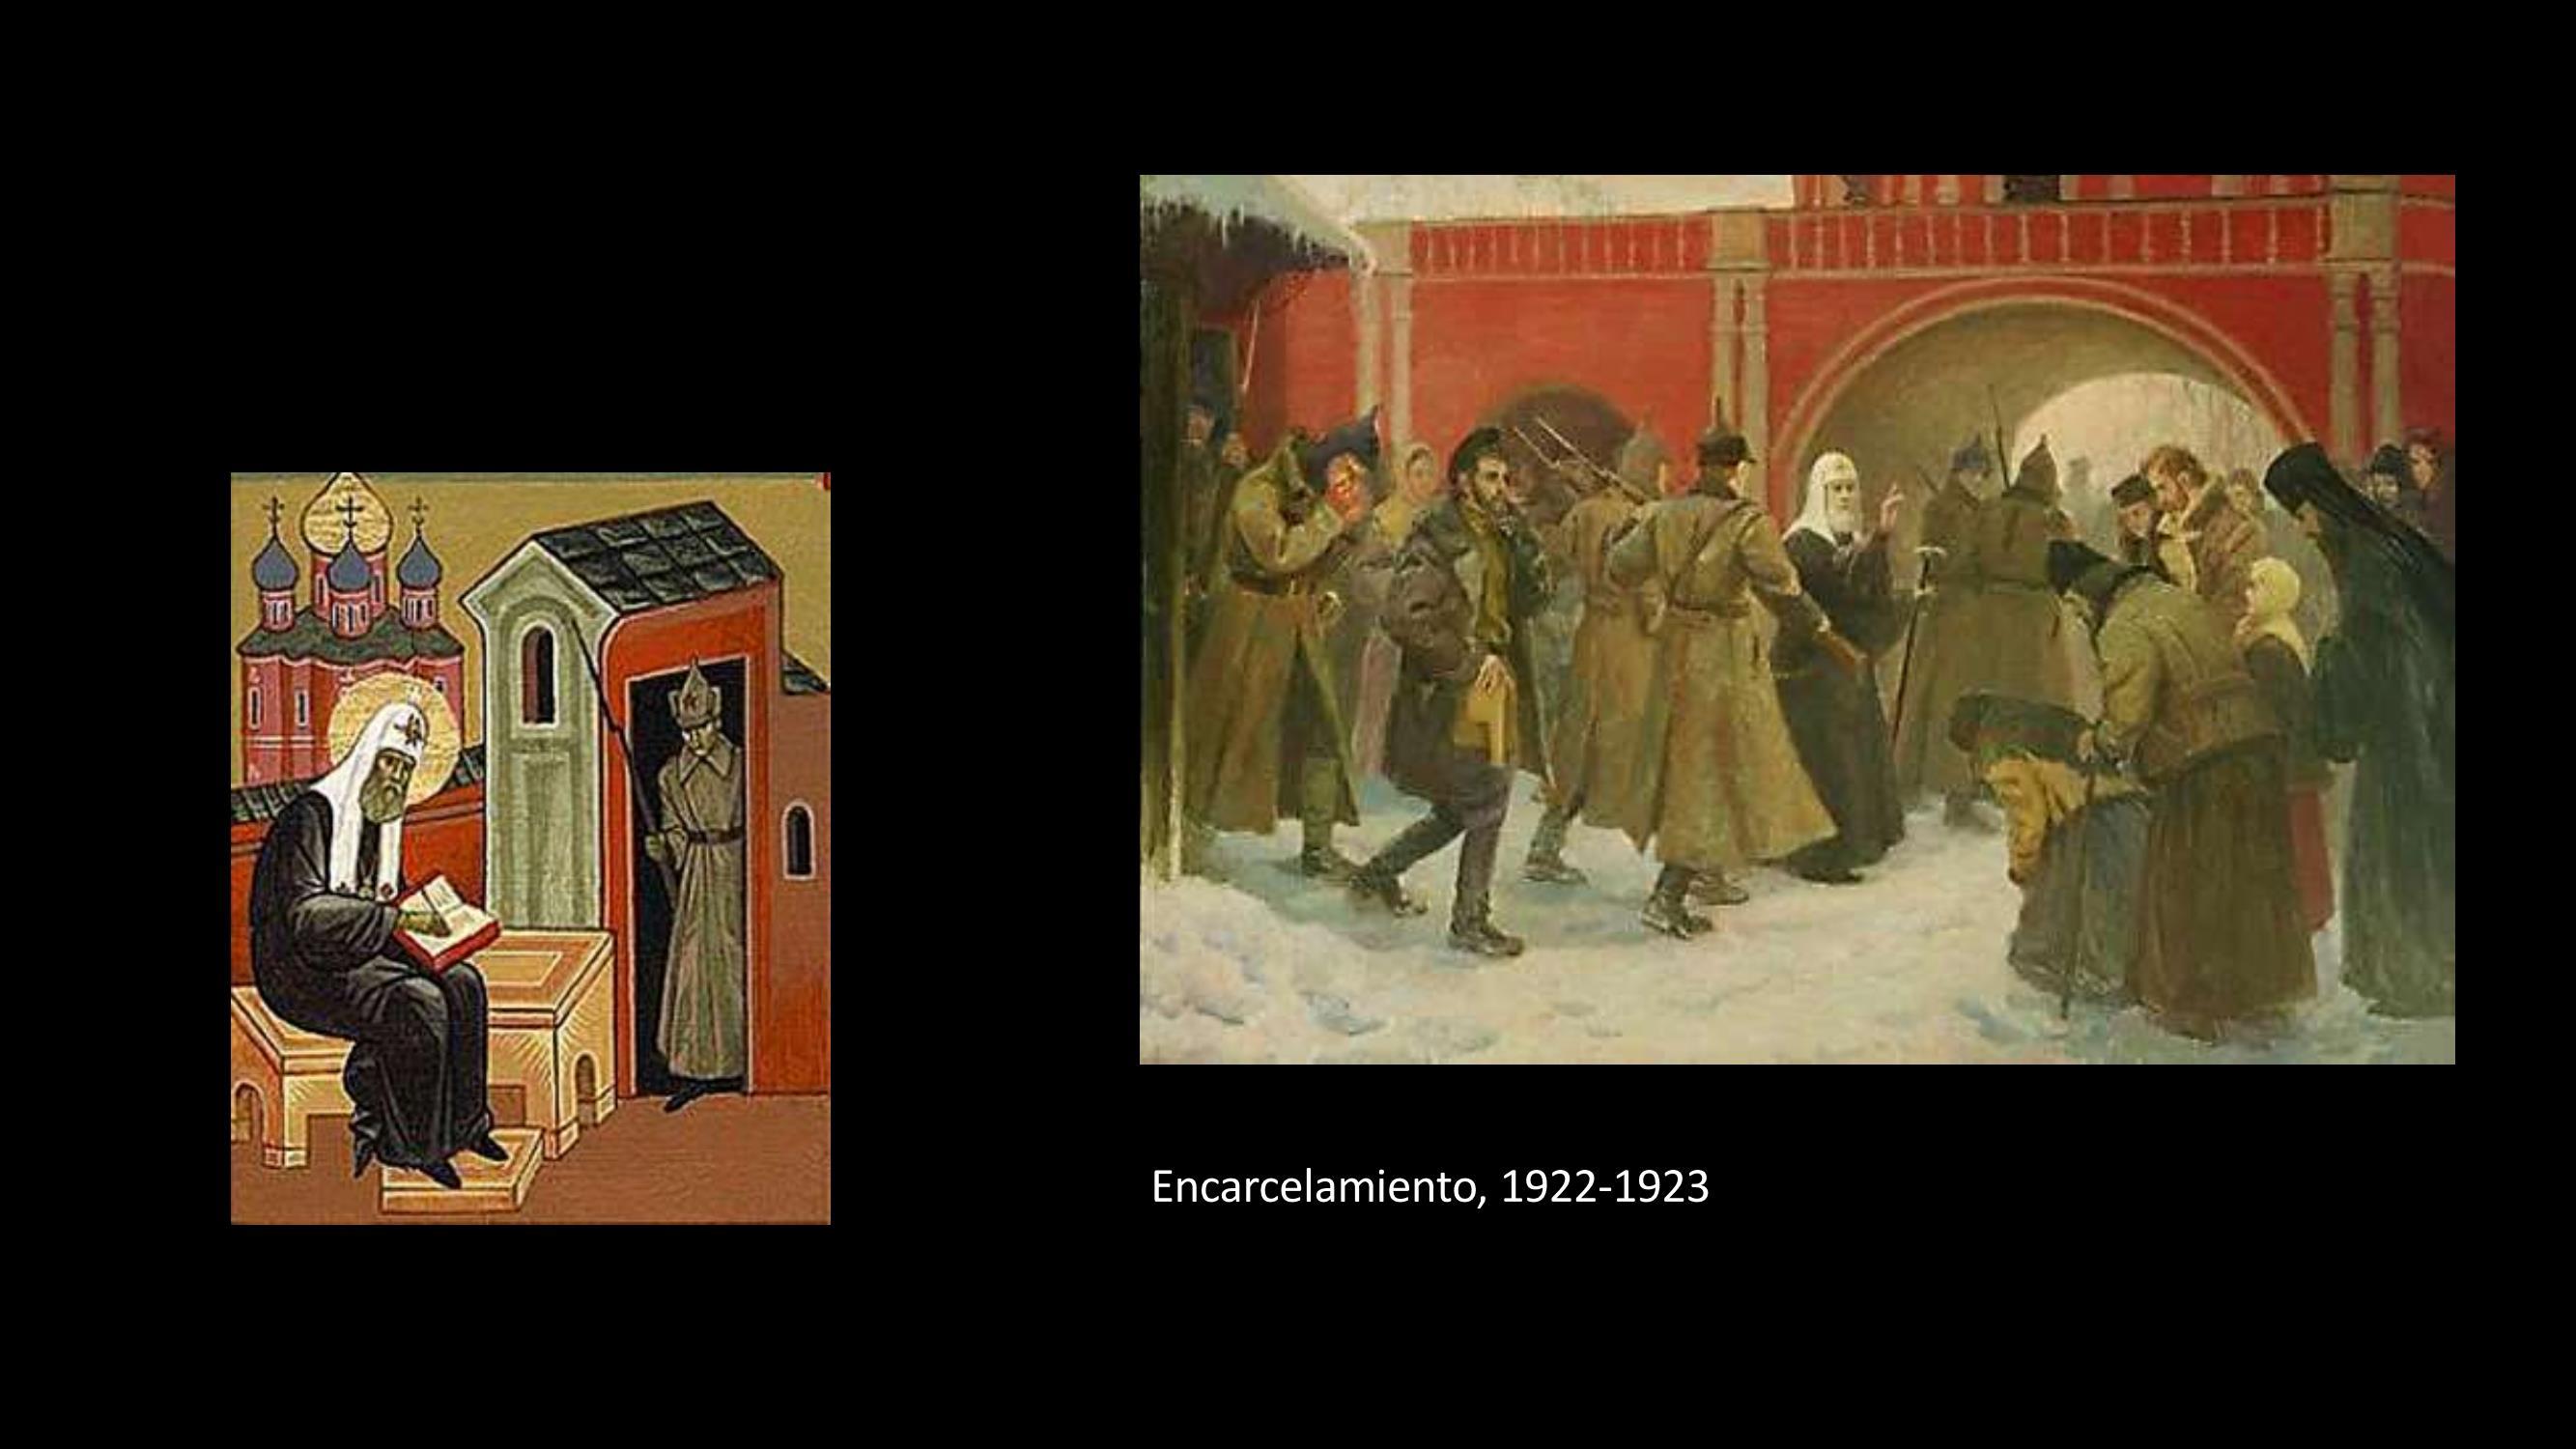 [34] Encarcelamiento, 1922-1923